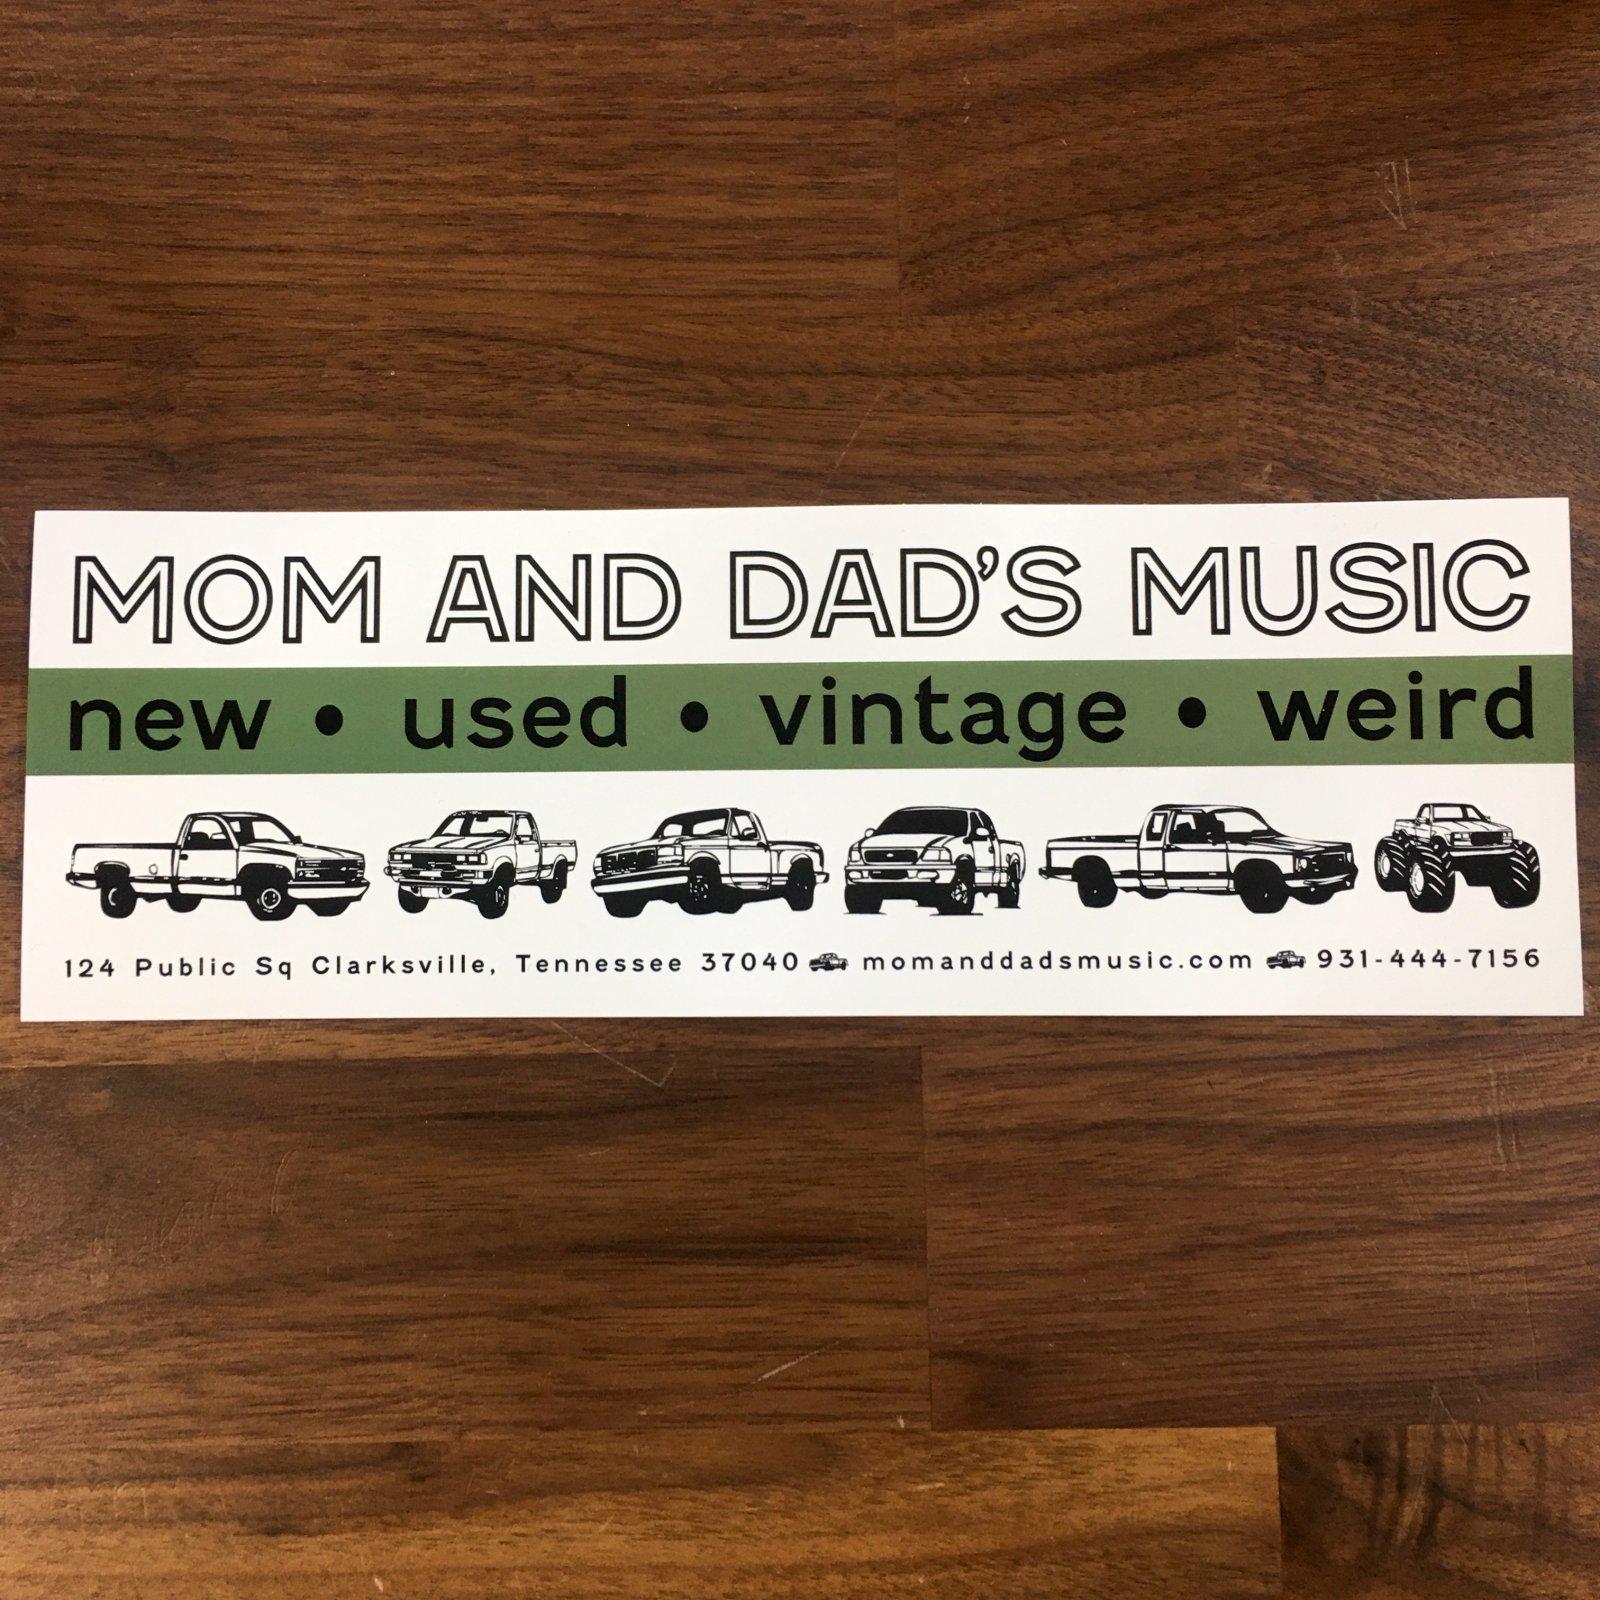 Mom and Dad's Music Trucks 9x3 Bumper Sticker